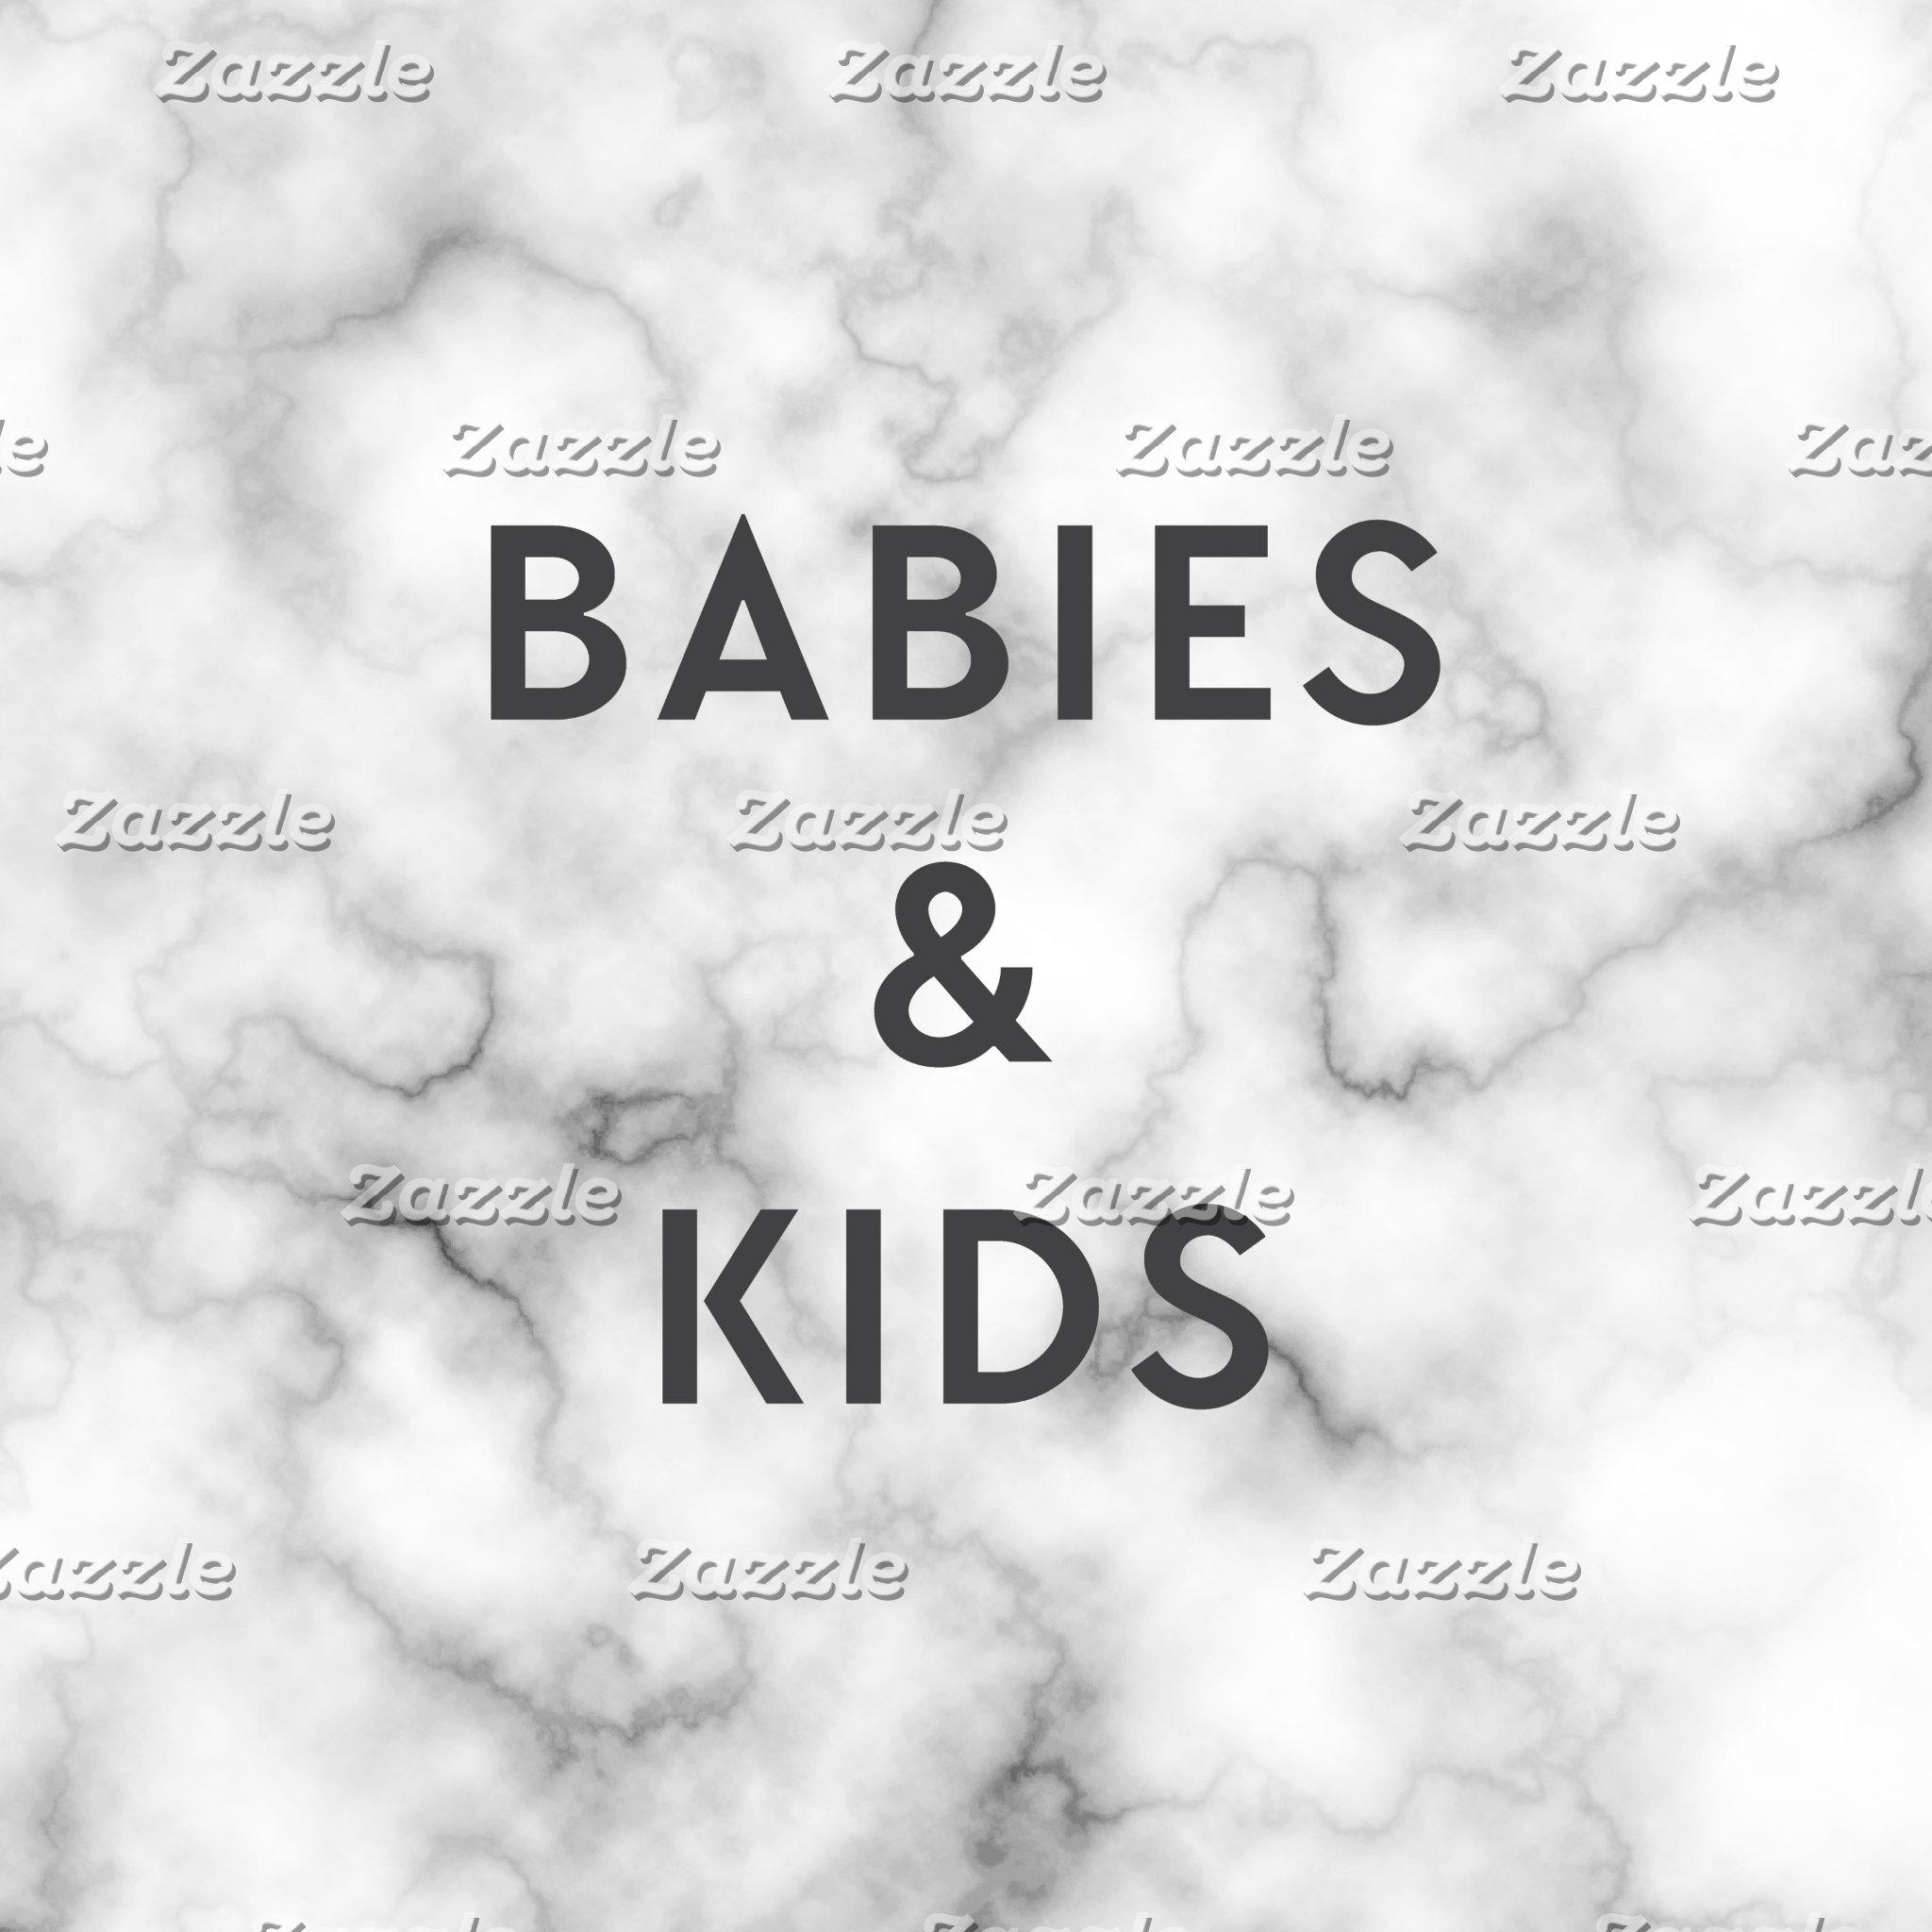 Babies & Kids